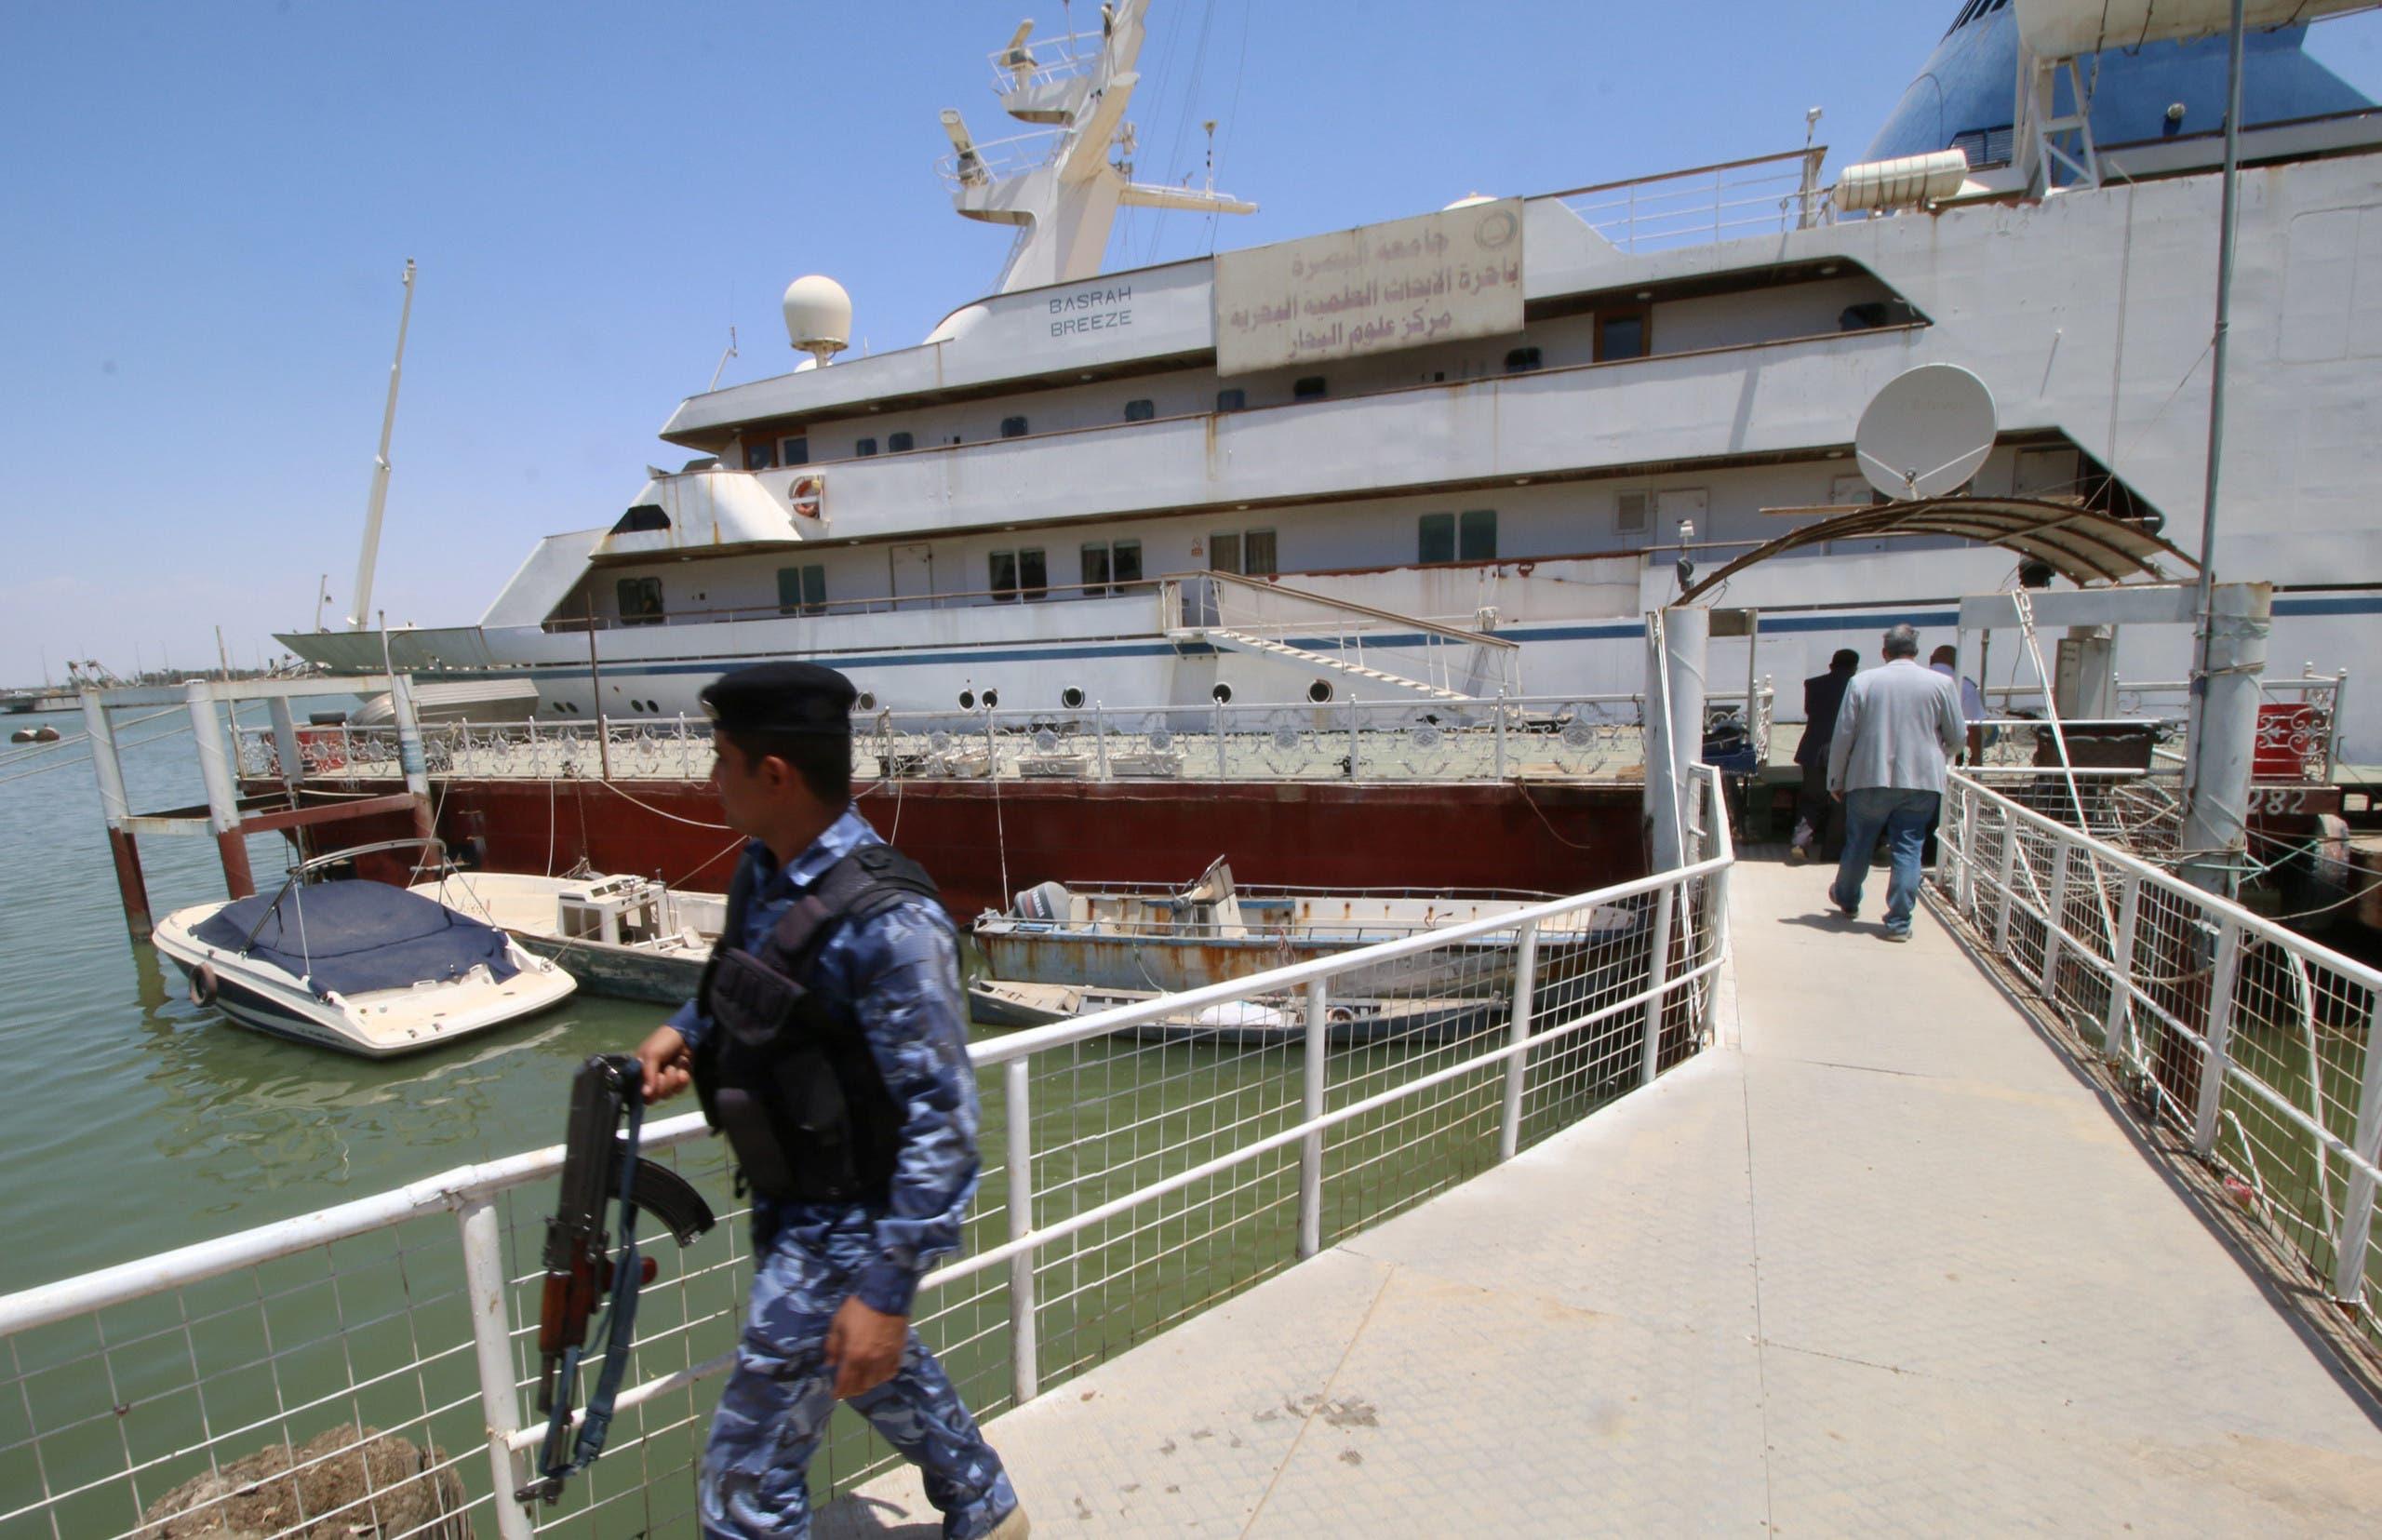 Saddam Hussein Yacht Basra. (Reuters)